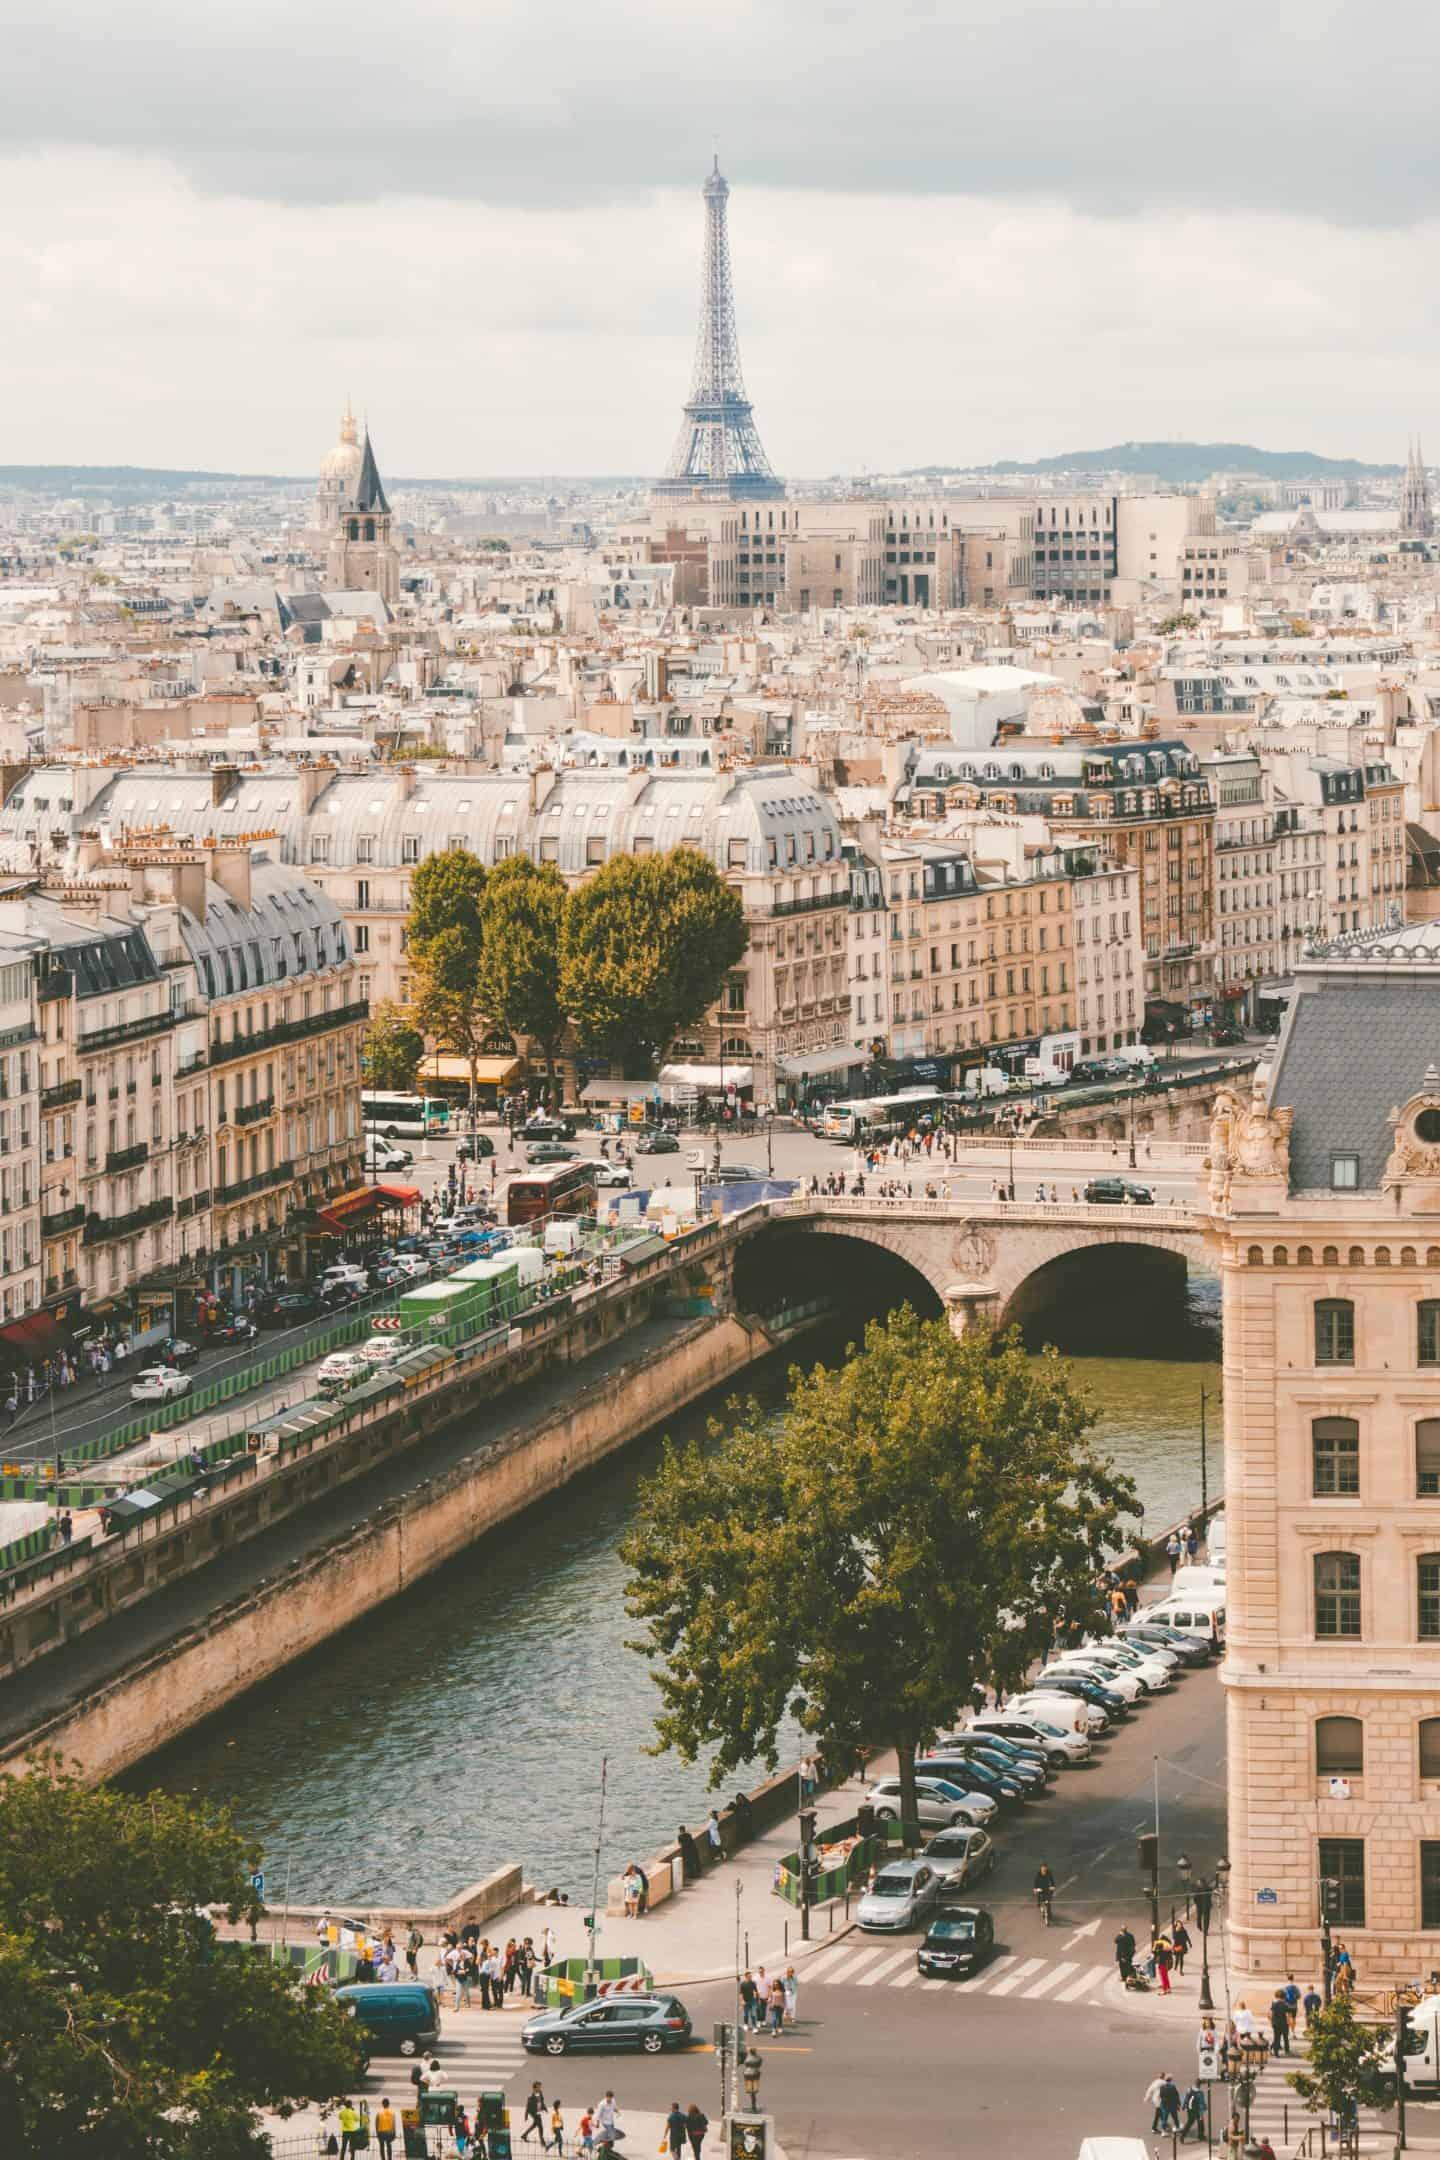 cheapest-train-tickets-london-to-paris